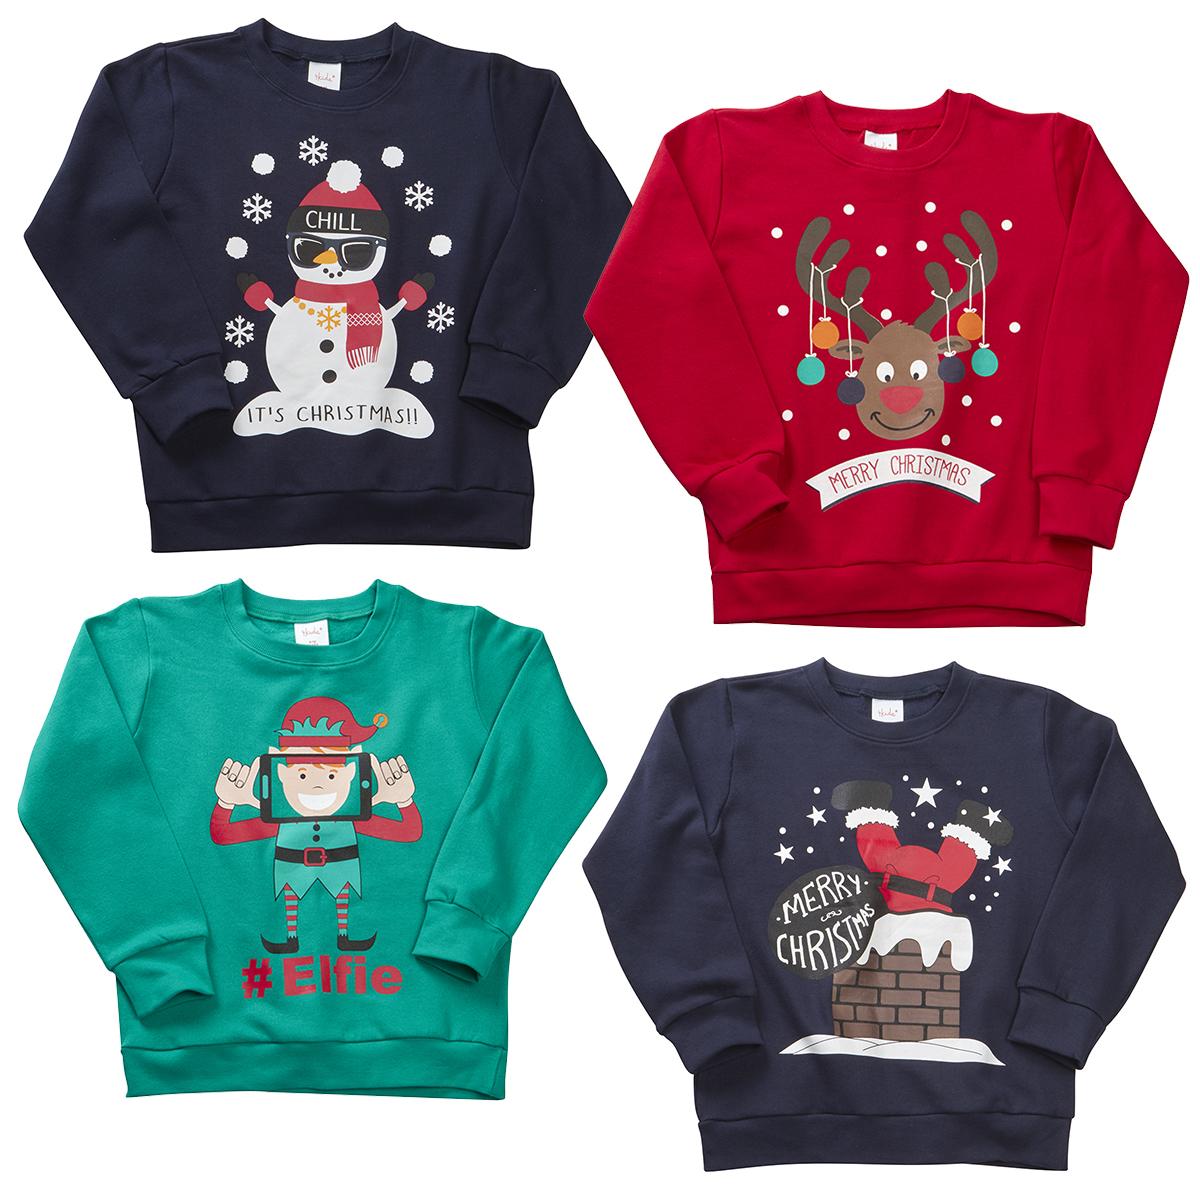 childrens boys christmas jumper sweatshirt xmas novelty. Black Bedroom Furniture Sets. Home Design Ideas